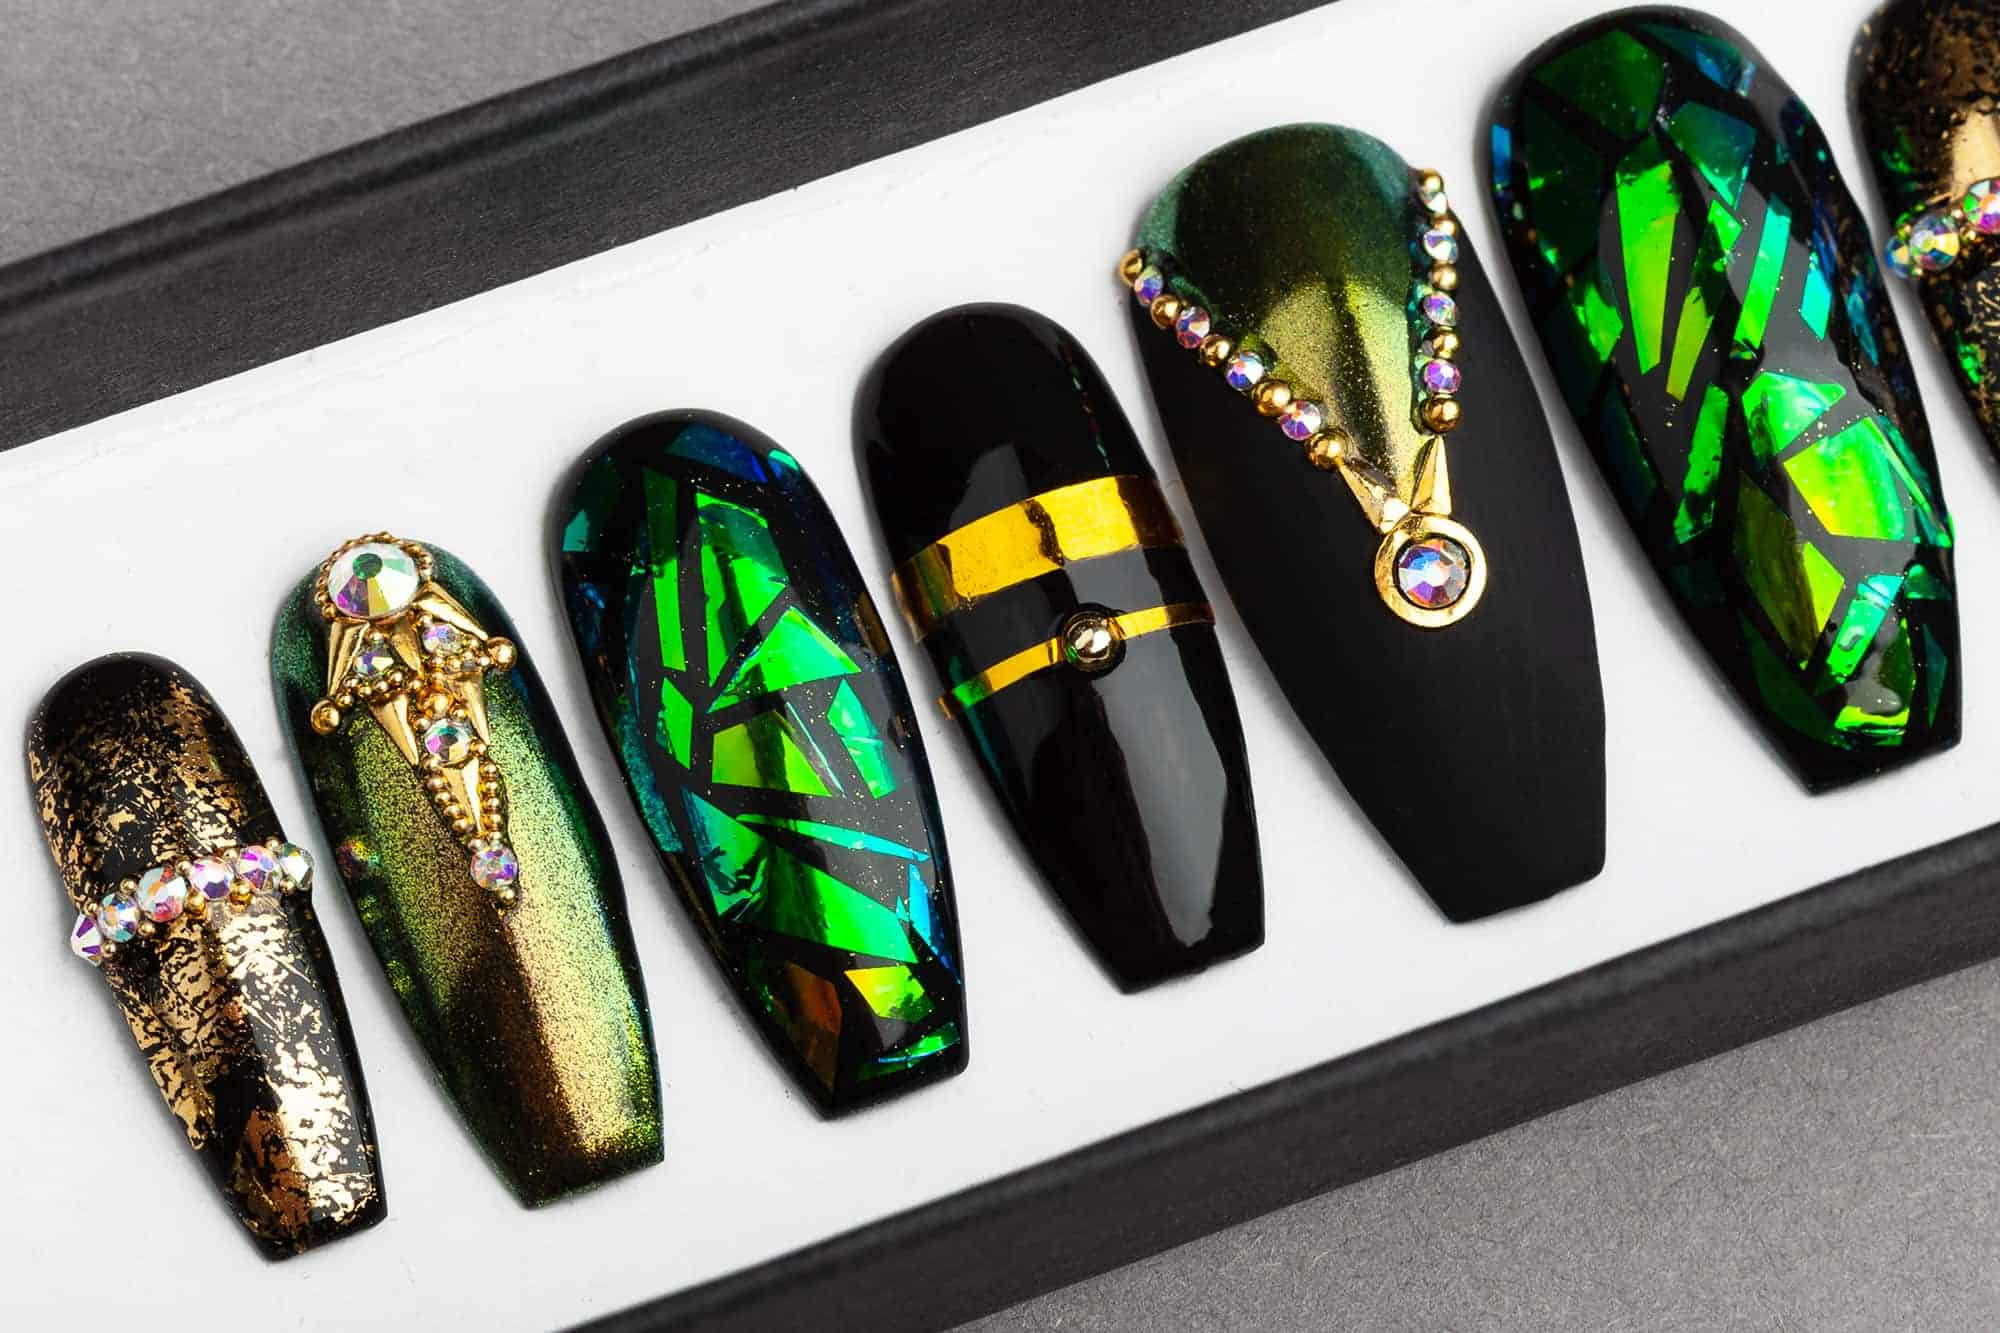 Egyptian Curse Press on Nails   Fake Nails   False Nails   Glue On Nails   Shattered Glass   Handpainted Nail Art